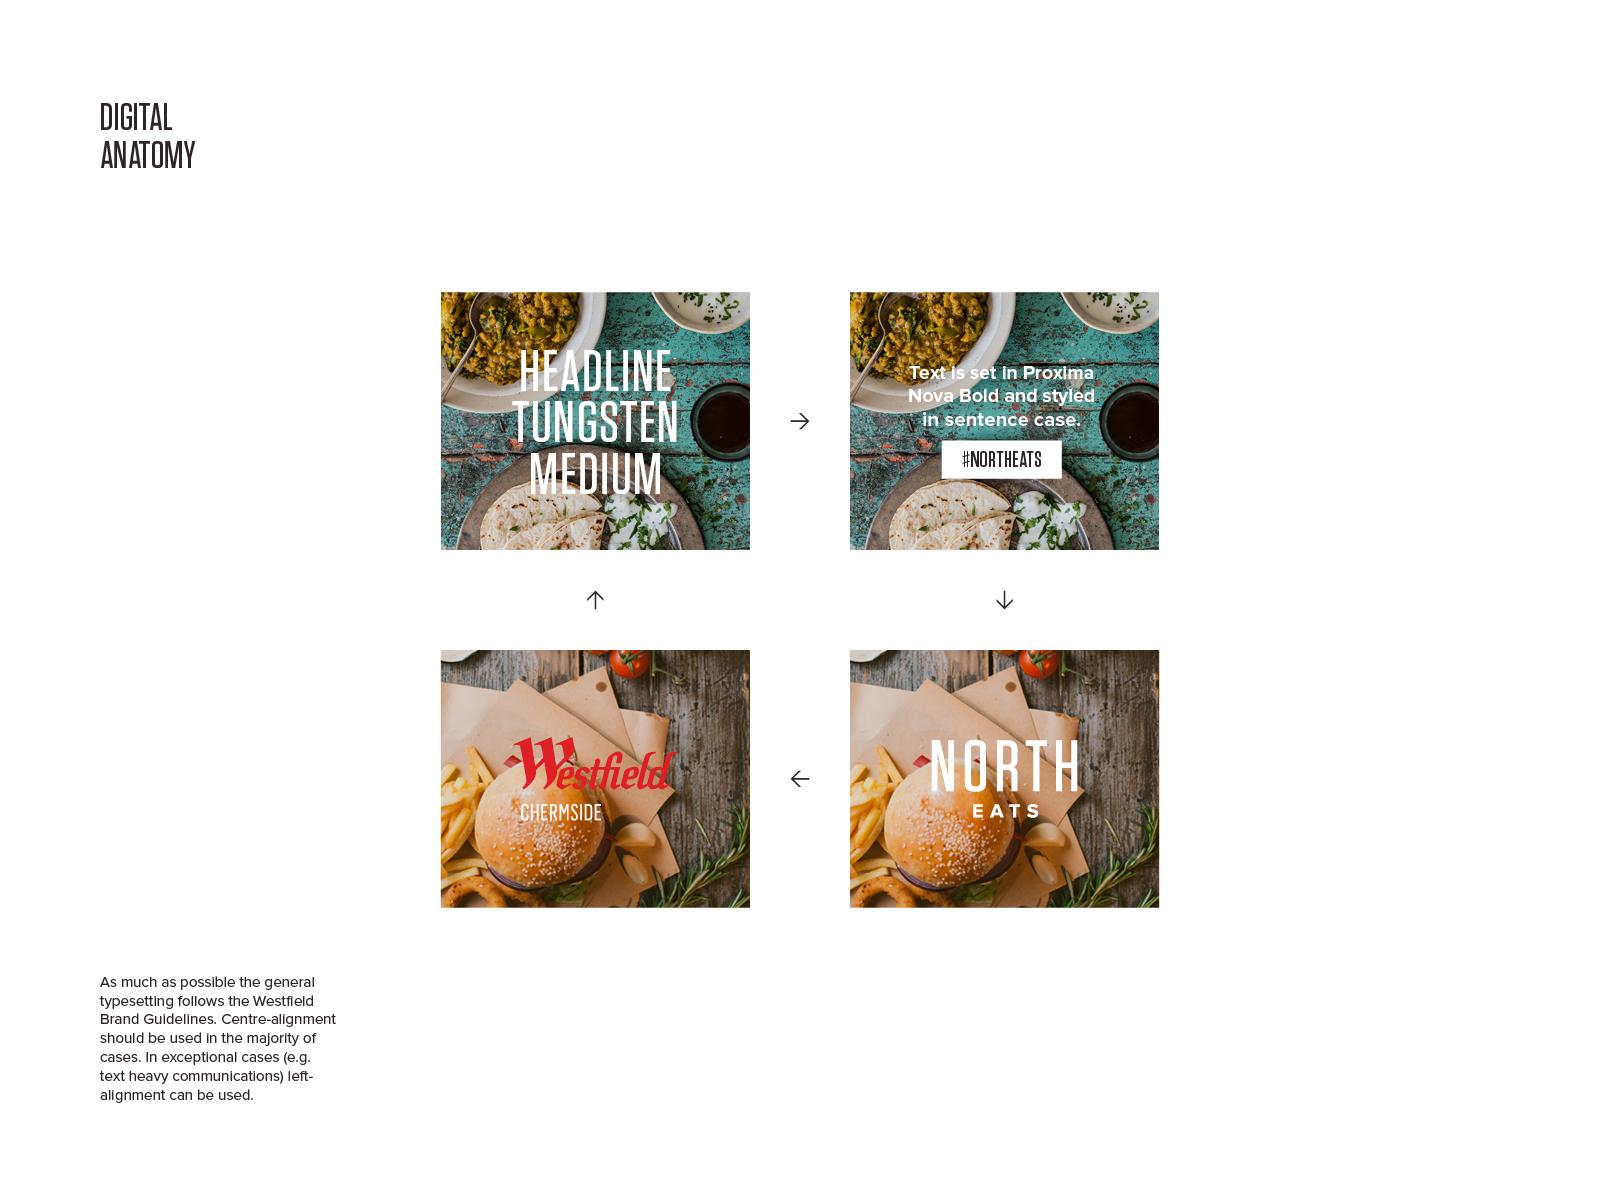 NorthEats-WebProject-7.jpg